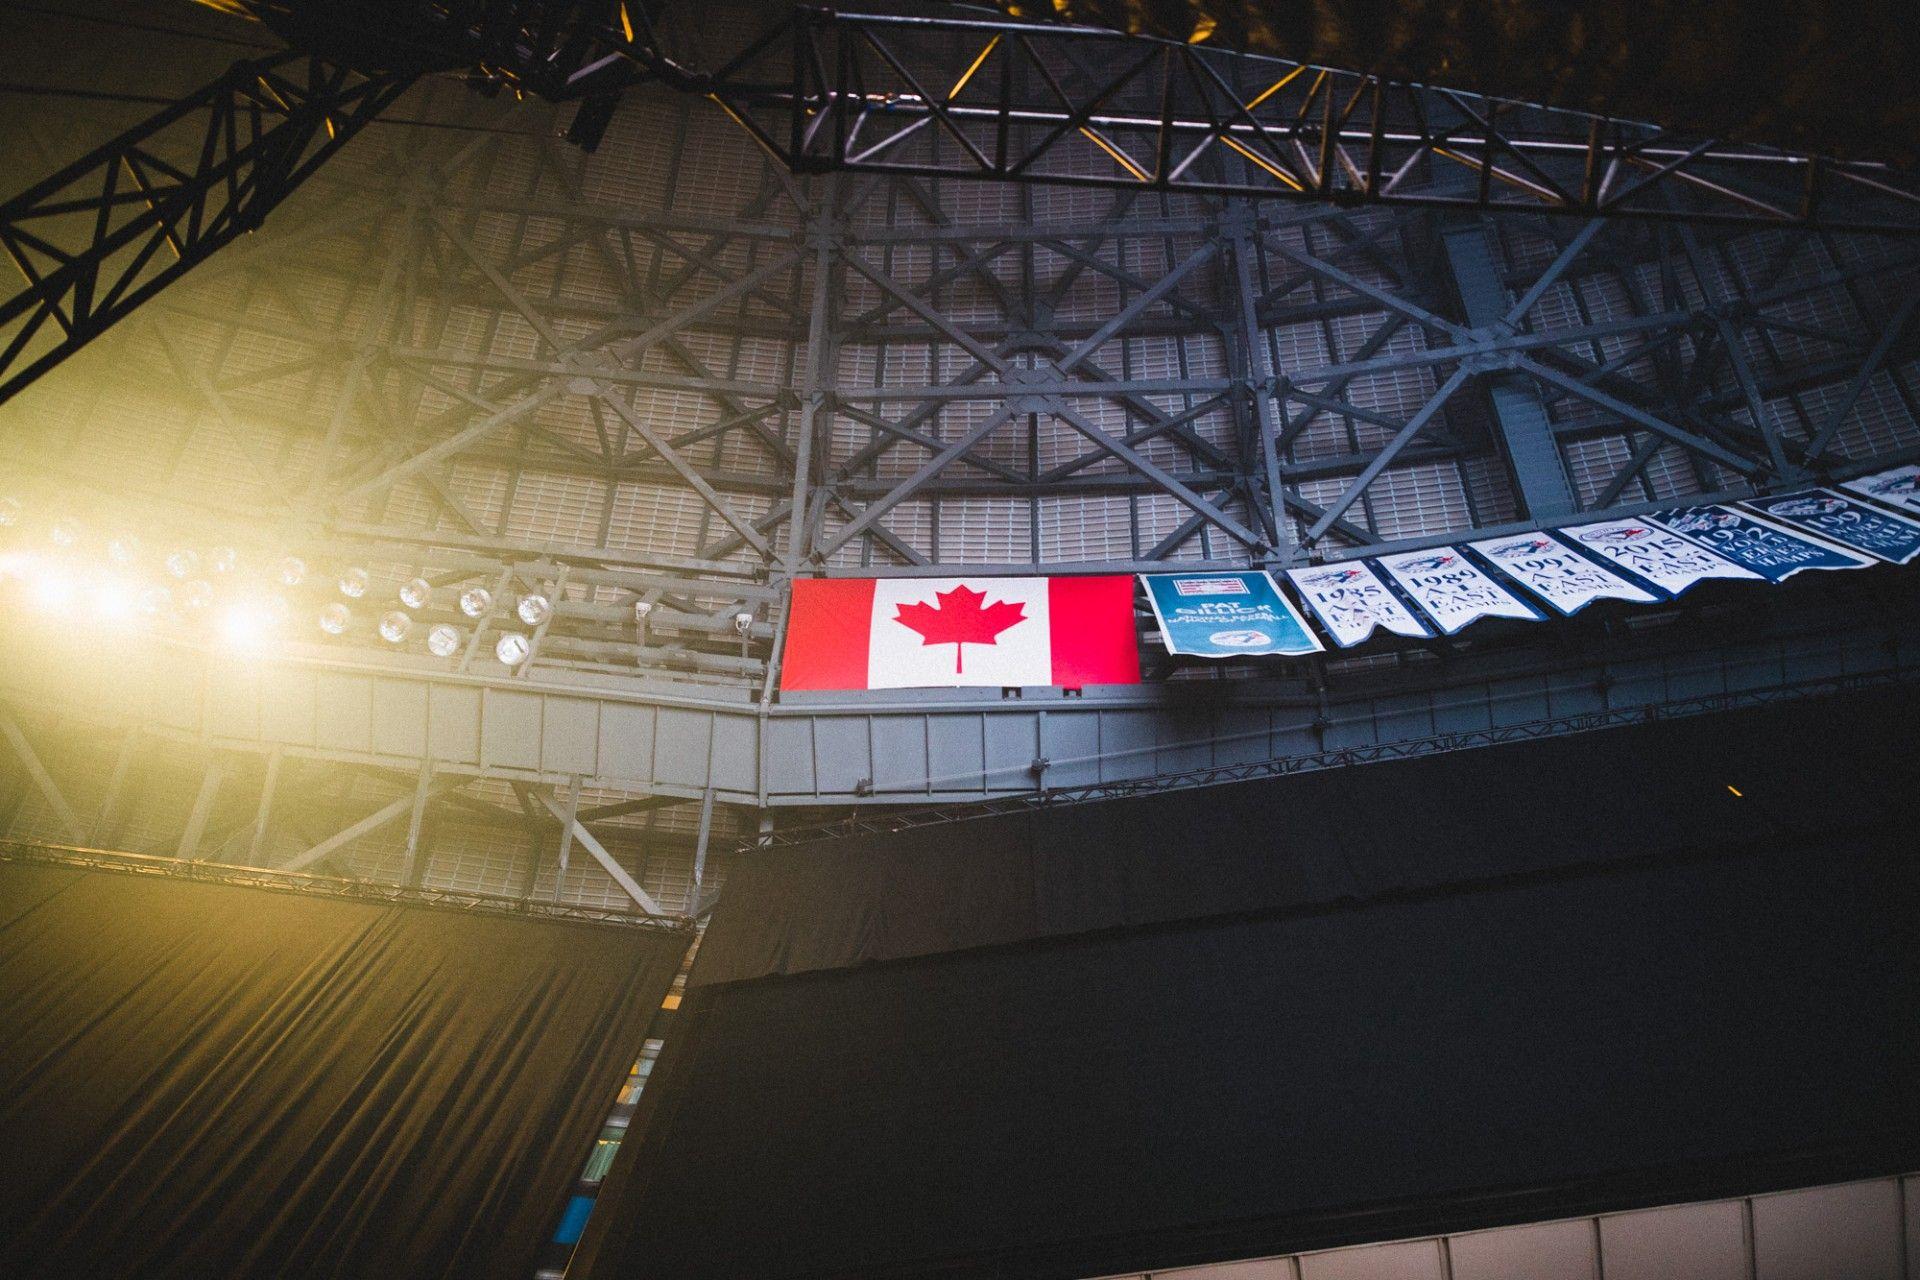 Formation World Tour Rogers Centre Toronto Ontario 25.05.2016